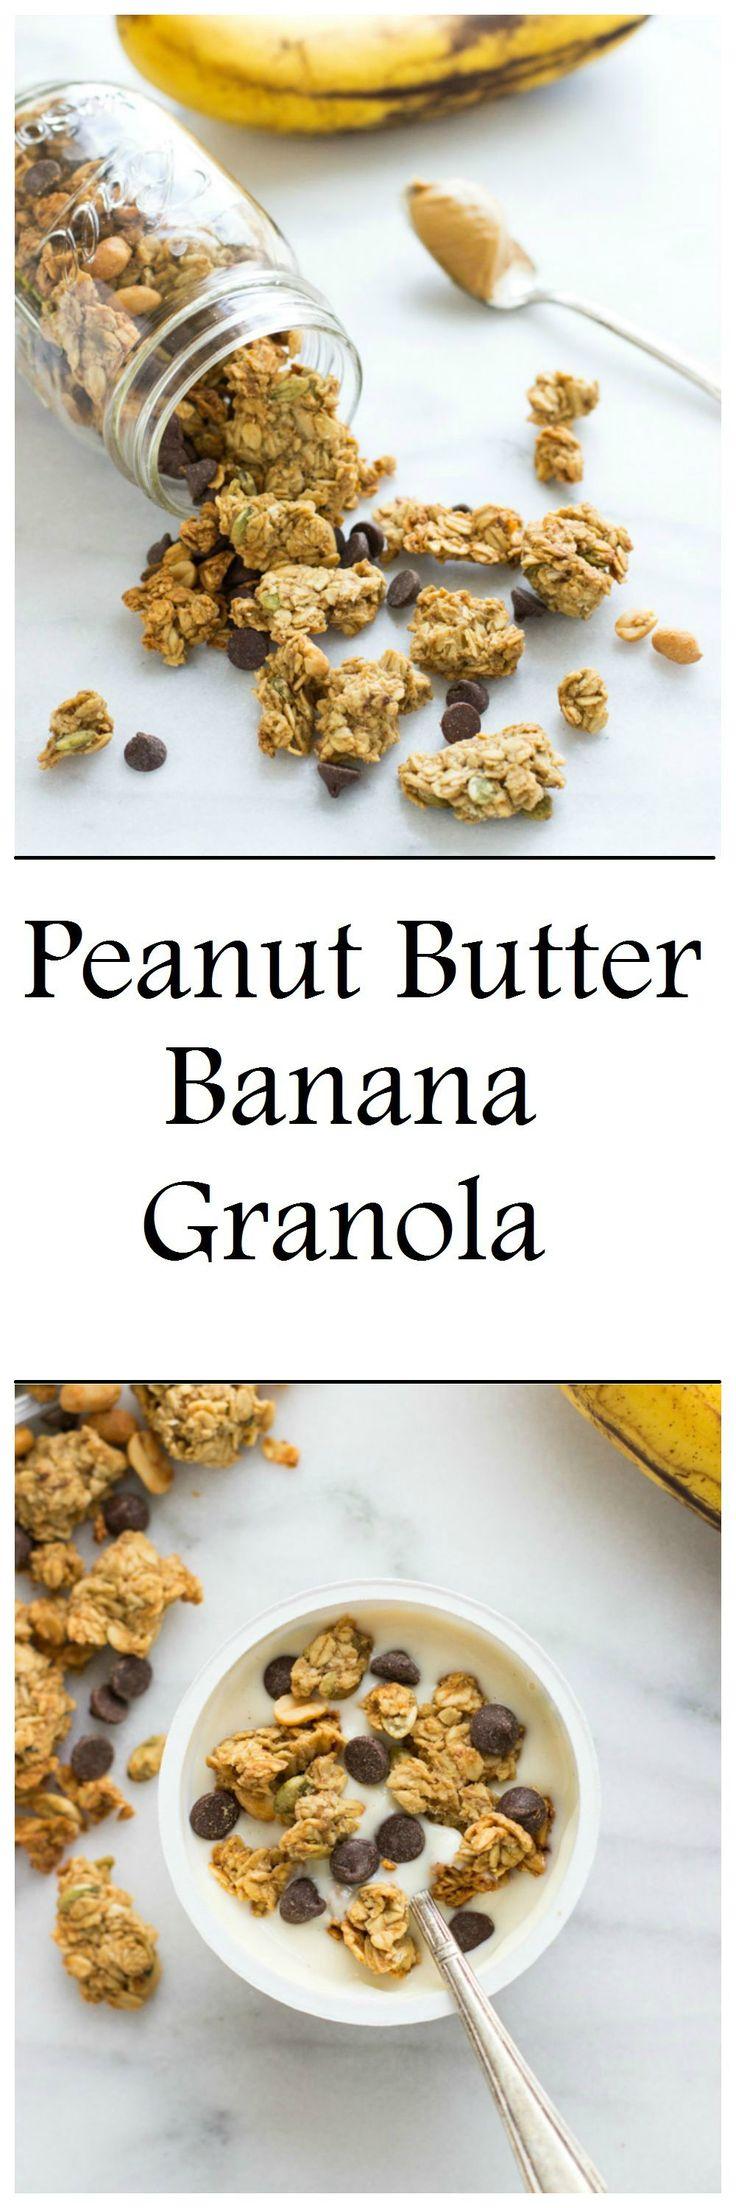 Peanut Butter Banana Granola- this recipe makes the biggest clusters EVER! #refinedsugarfree #glutenfree